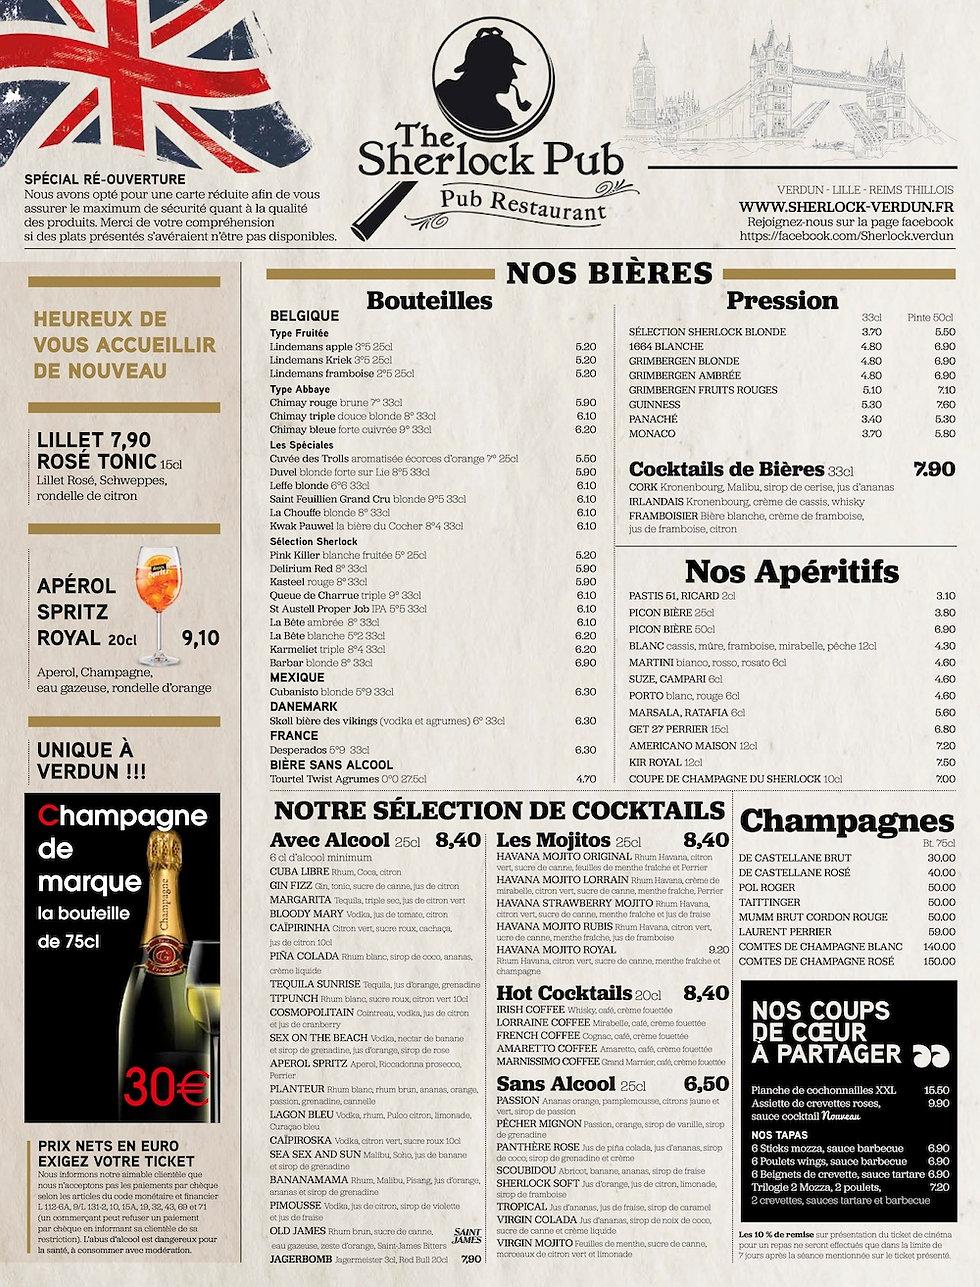 1 Restaurant Verdun Brasserie Verdun - T